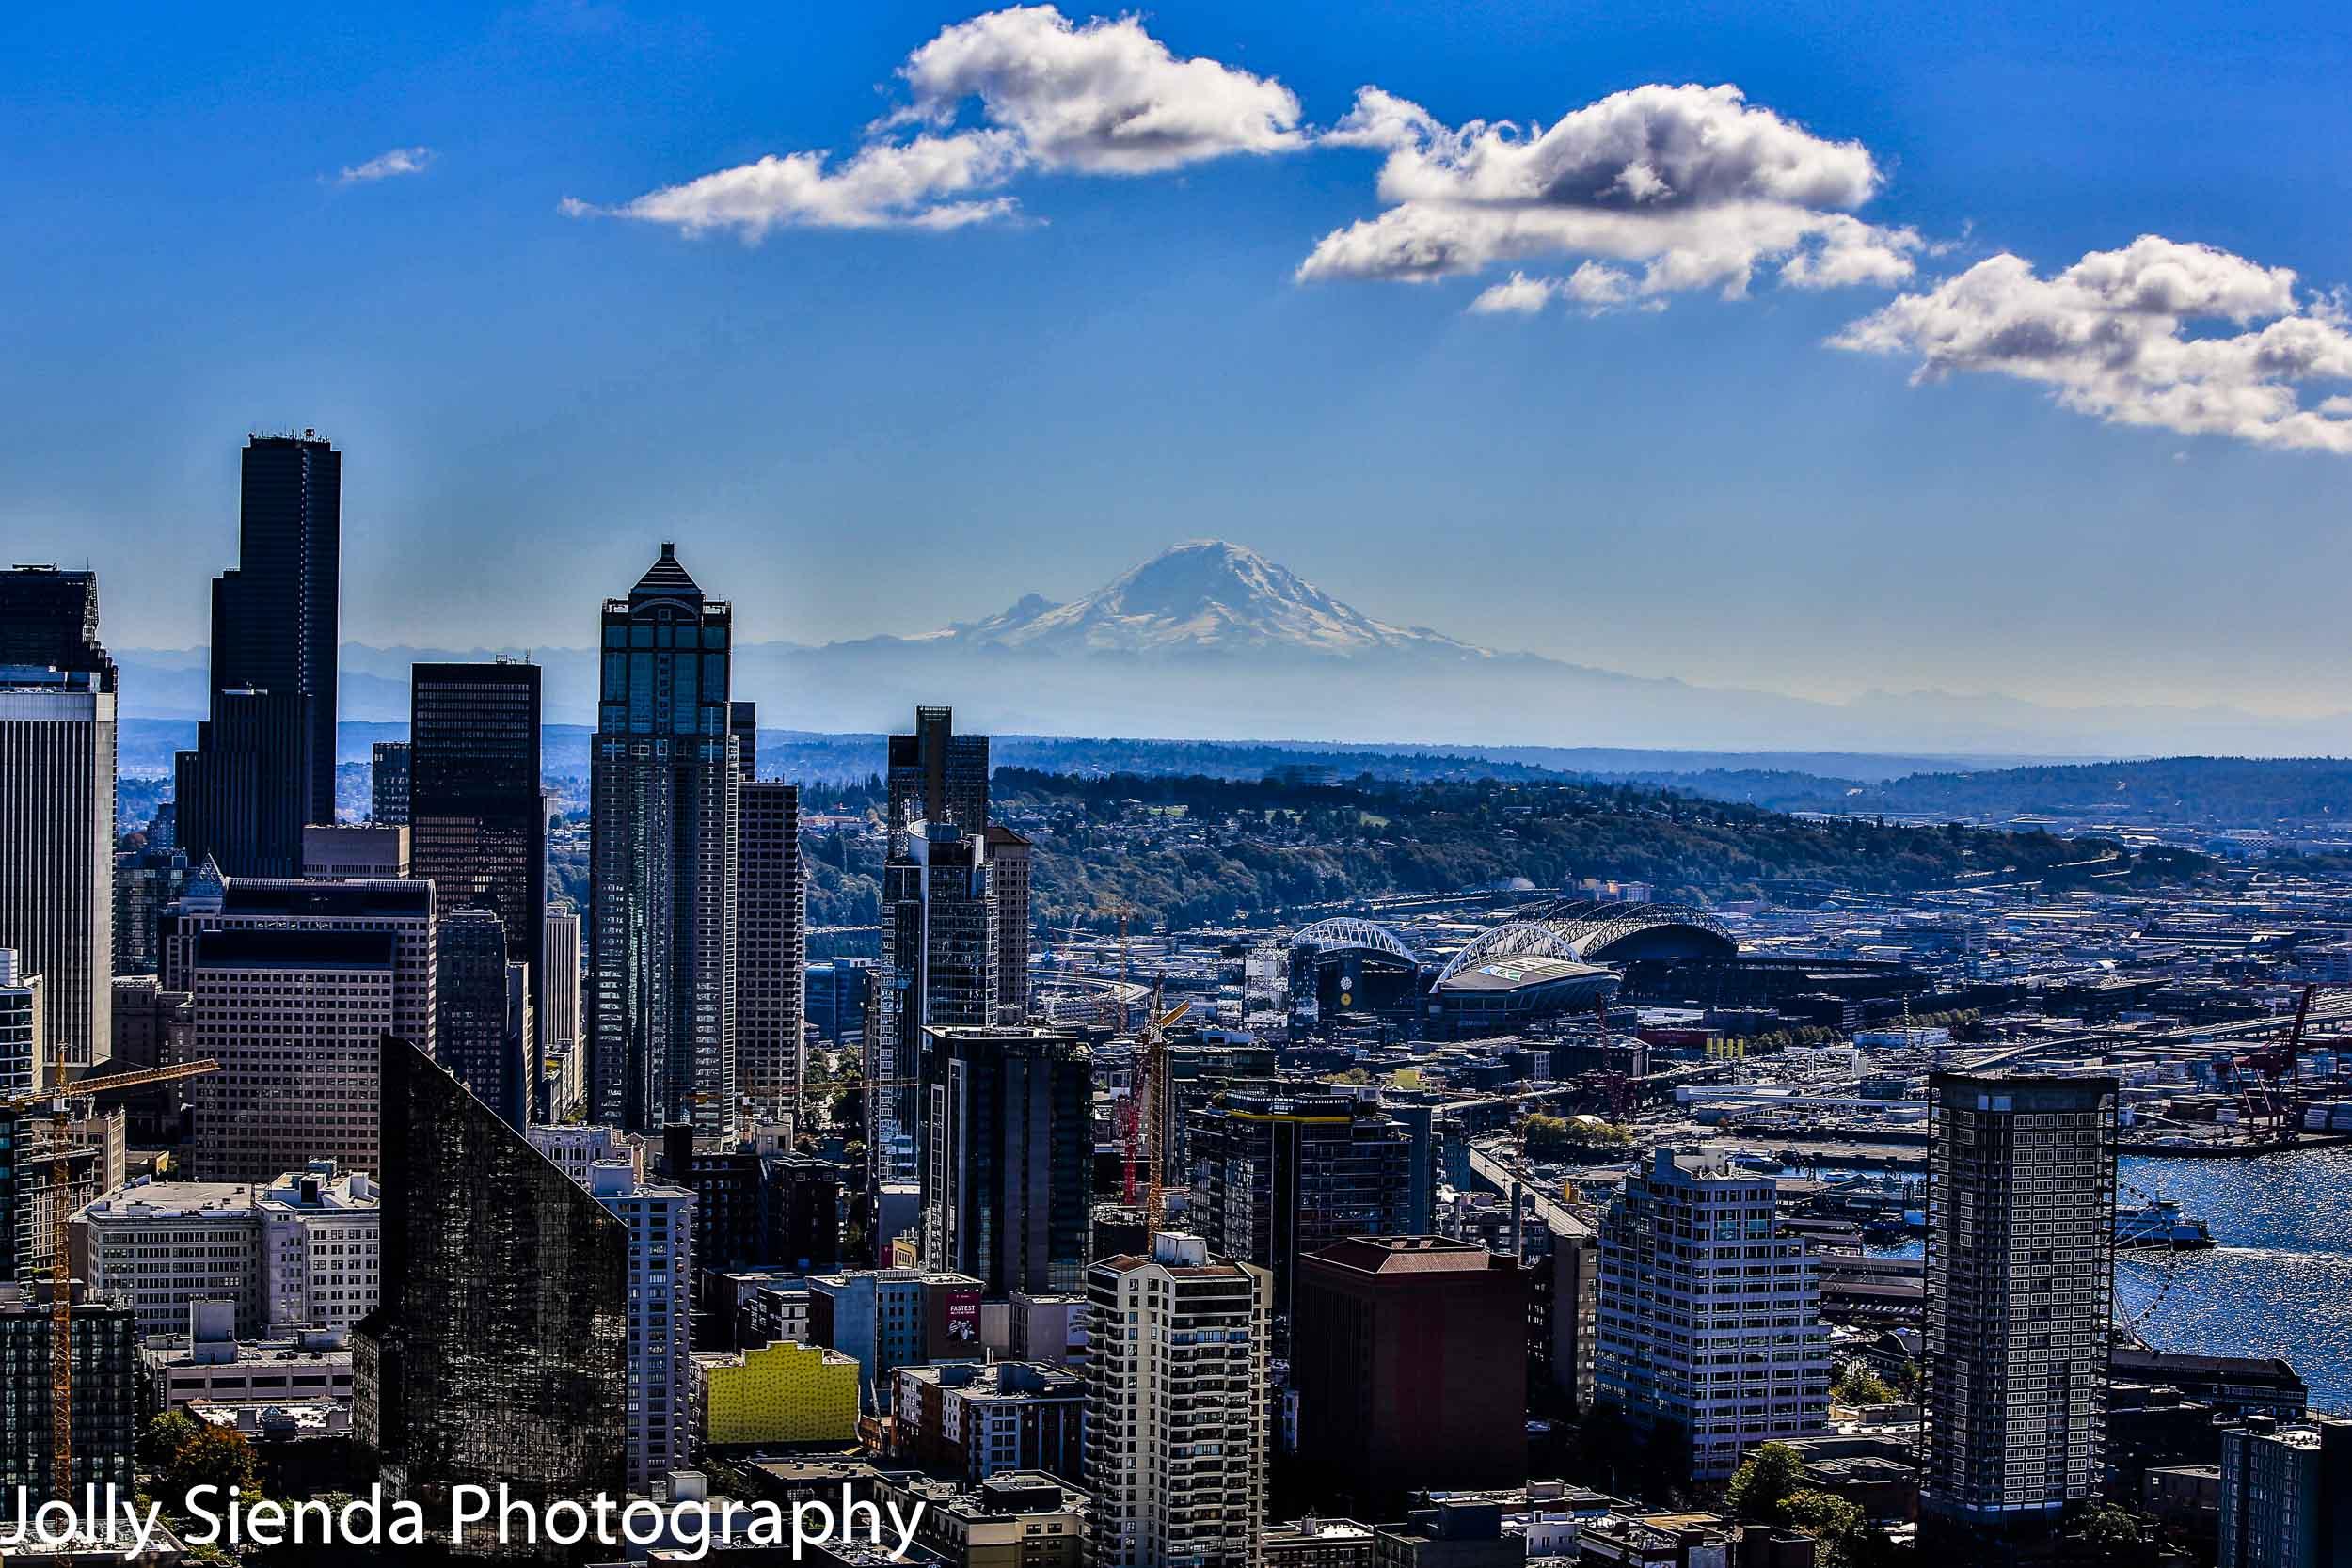 Downtown Seattle skyline and Mount Rainier